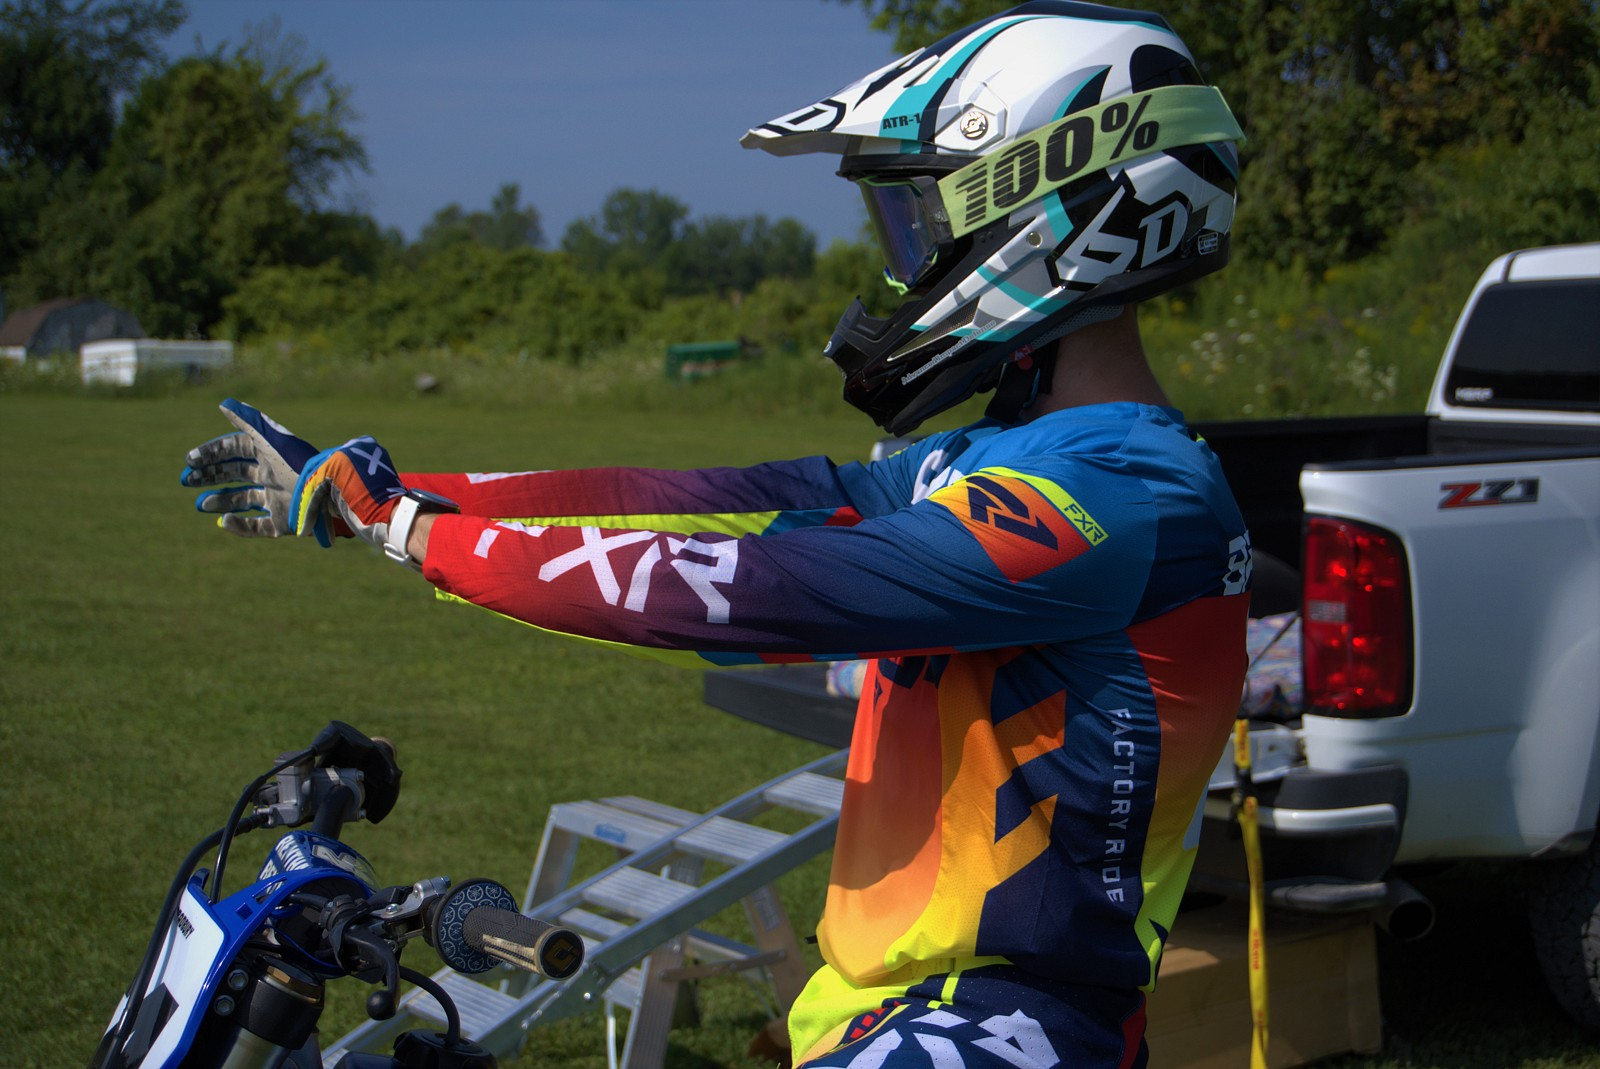 Photo 1 - DawsonBMX54 - Motocross Pictures - Vital MX